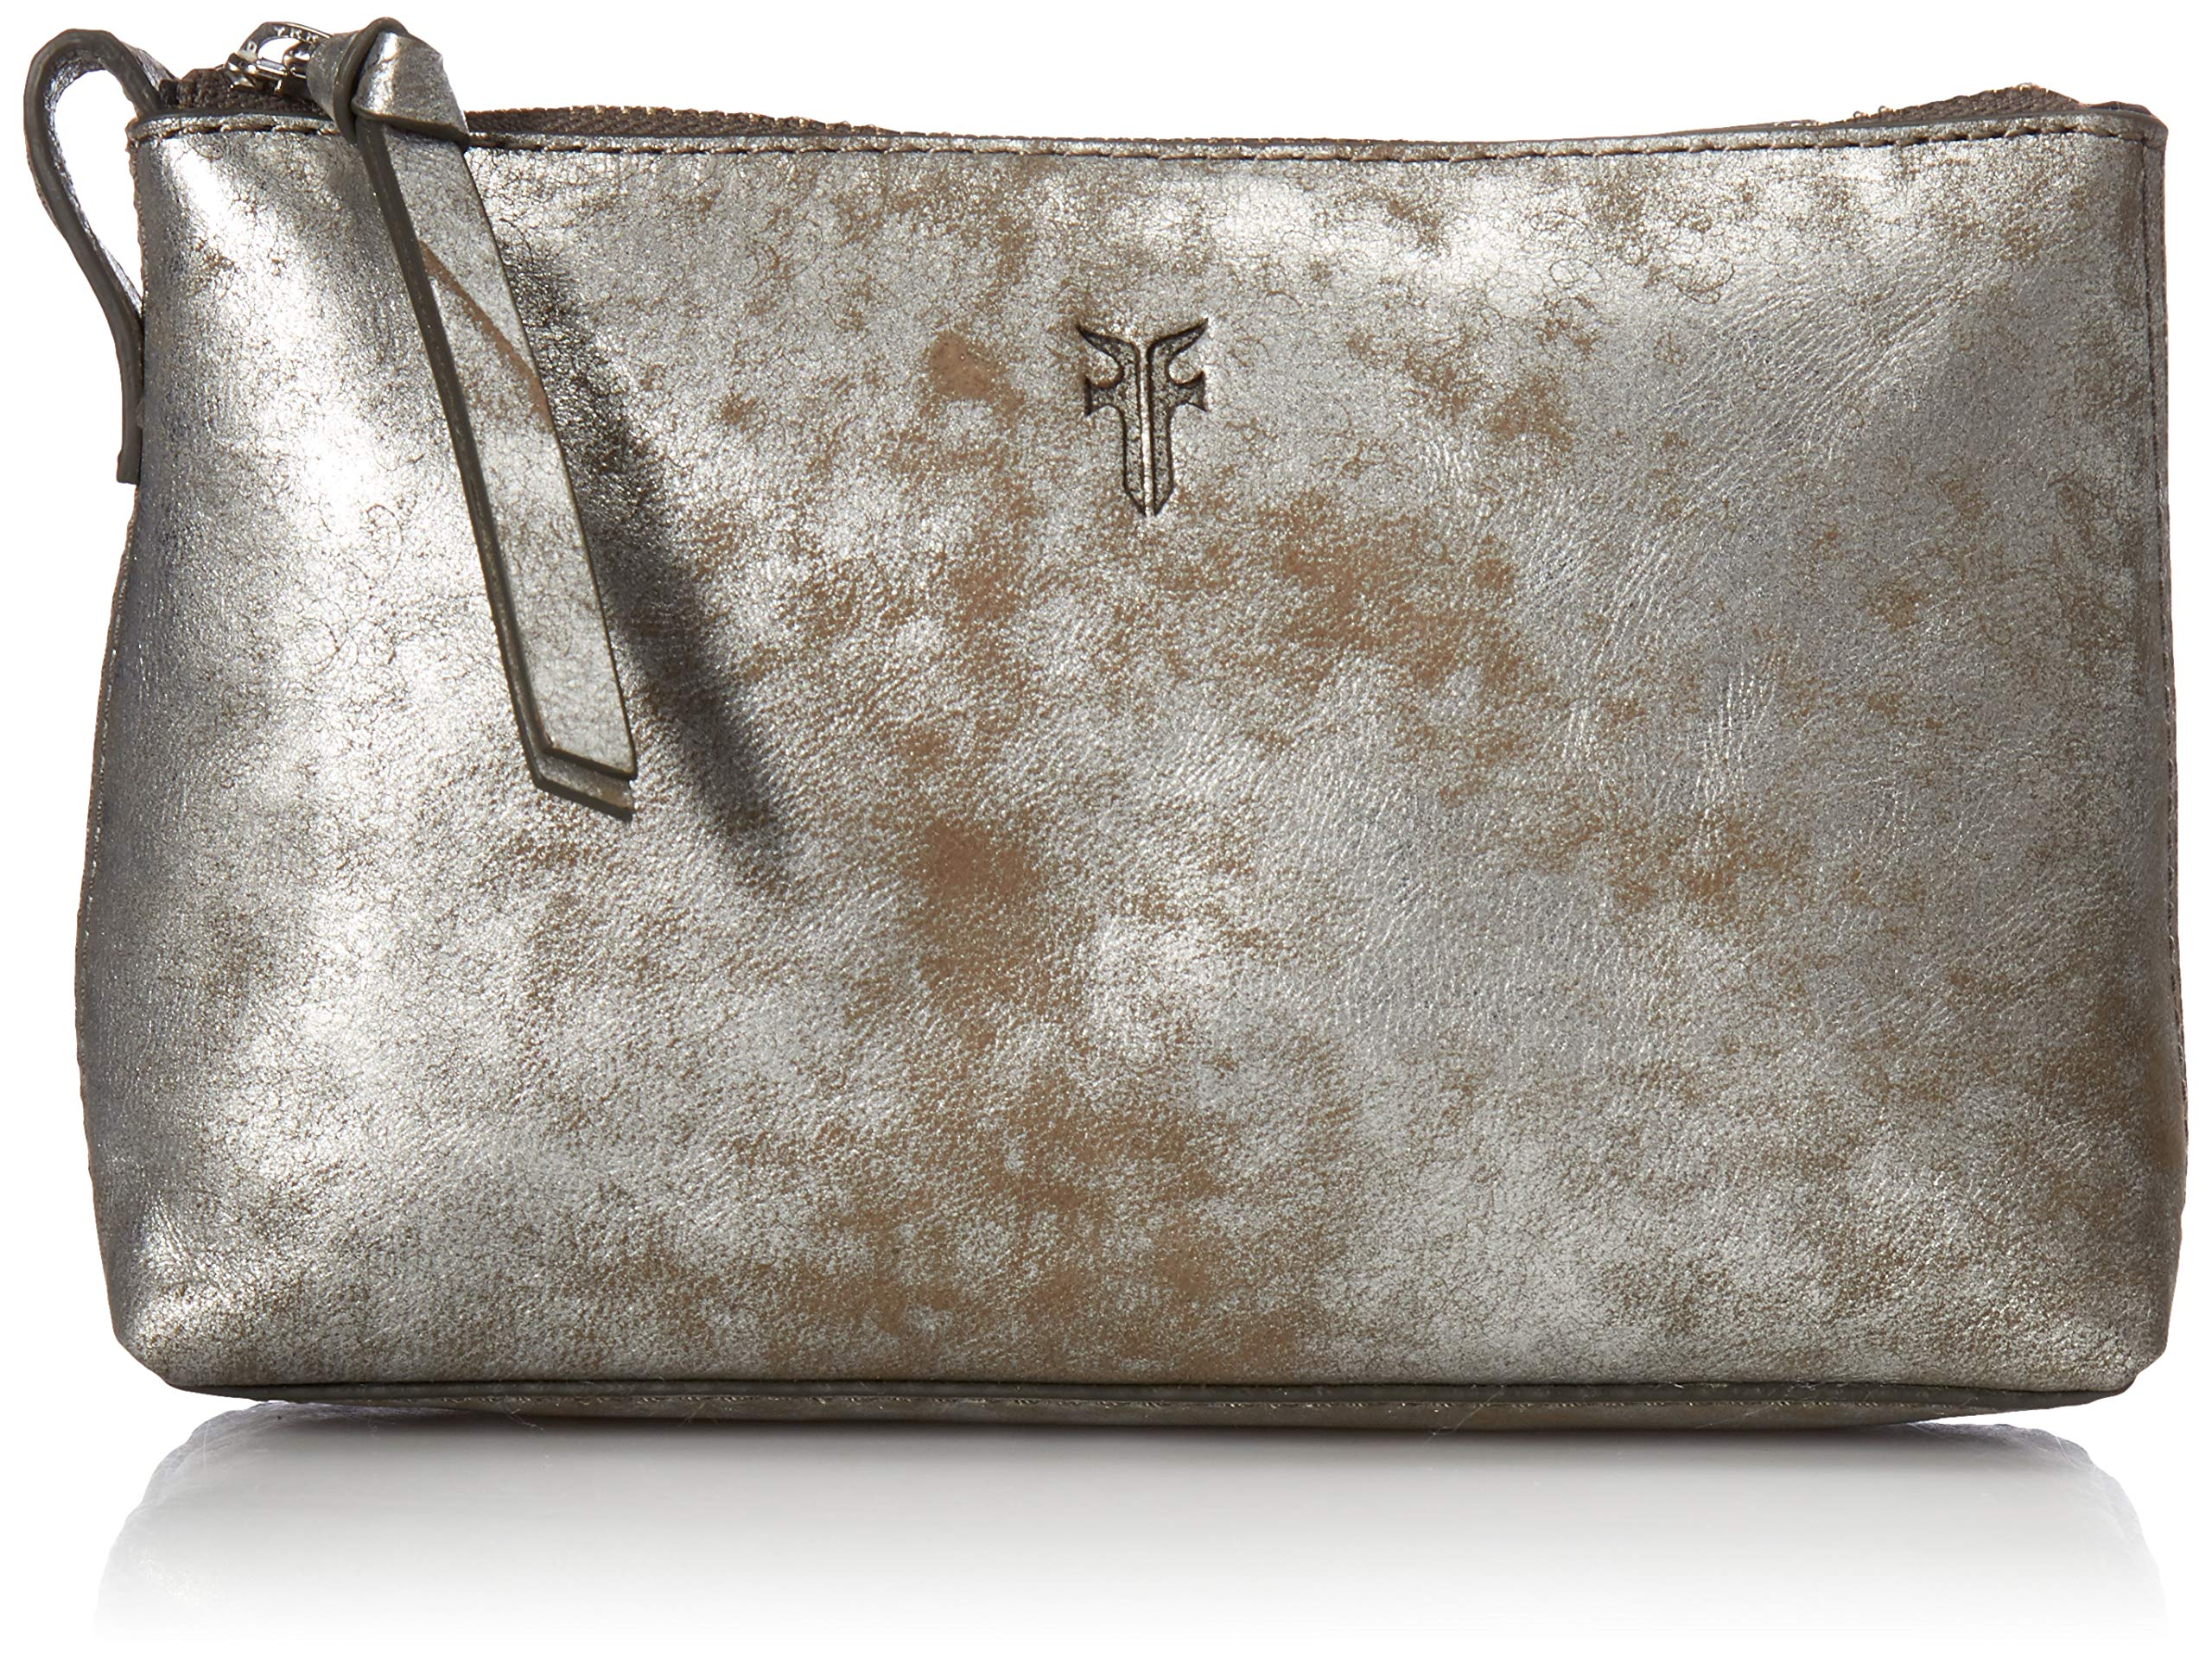 FRYE Leather Zip Makeup Case, silver